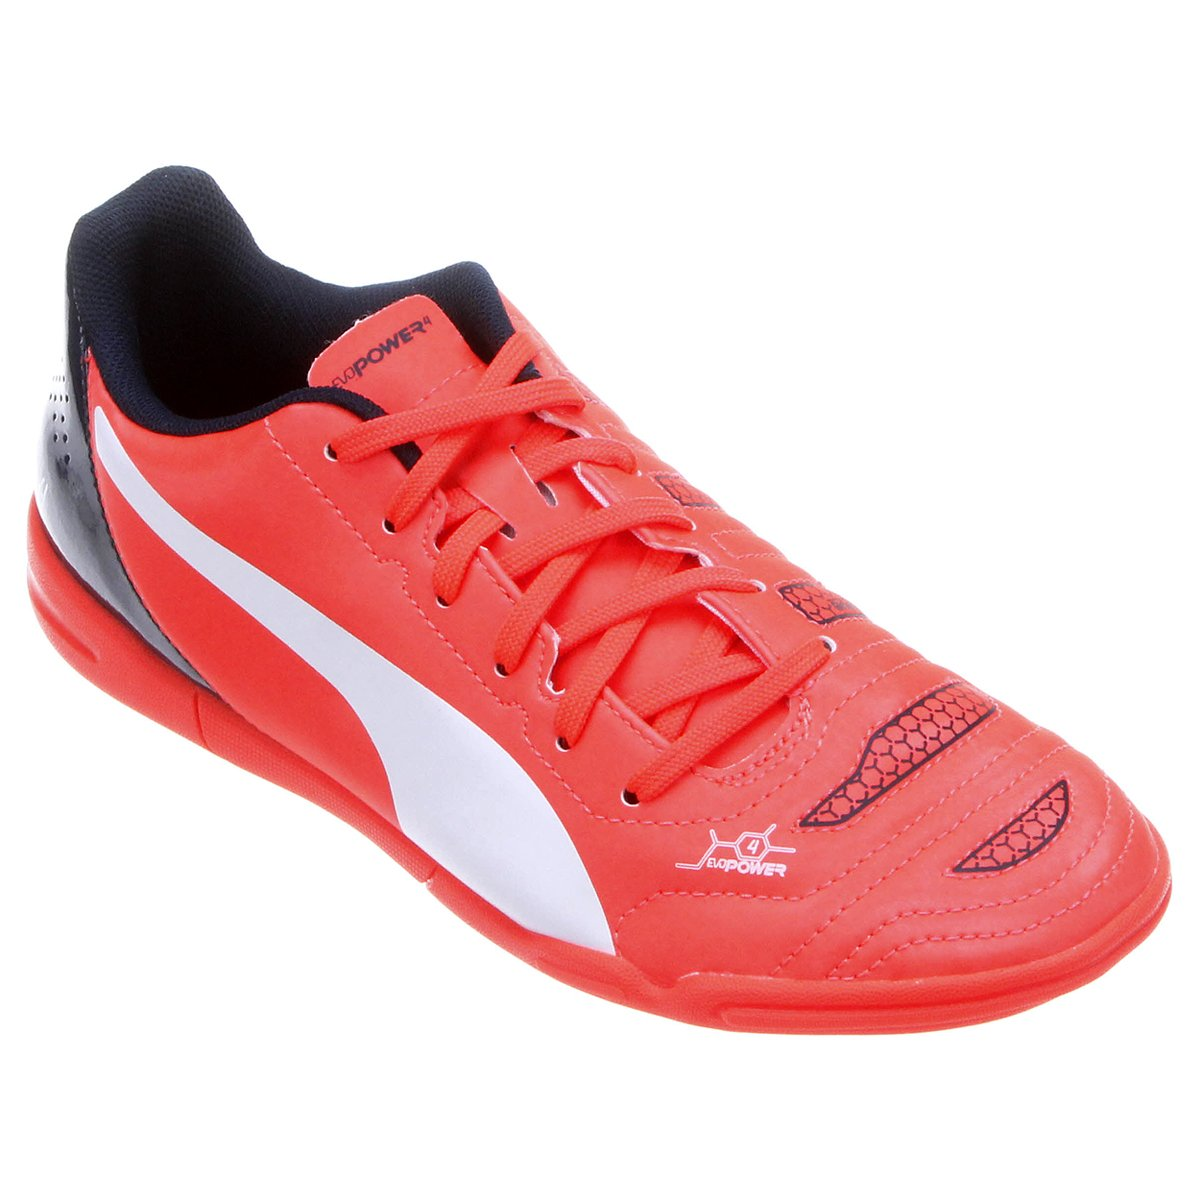 35%OFF Chuteira Puma Evopower 4.2 IT Futsal Juvenil e8e326f26d09e